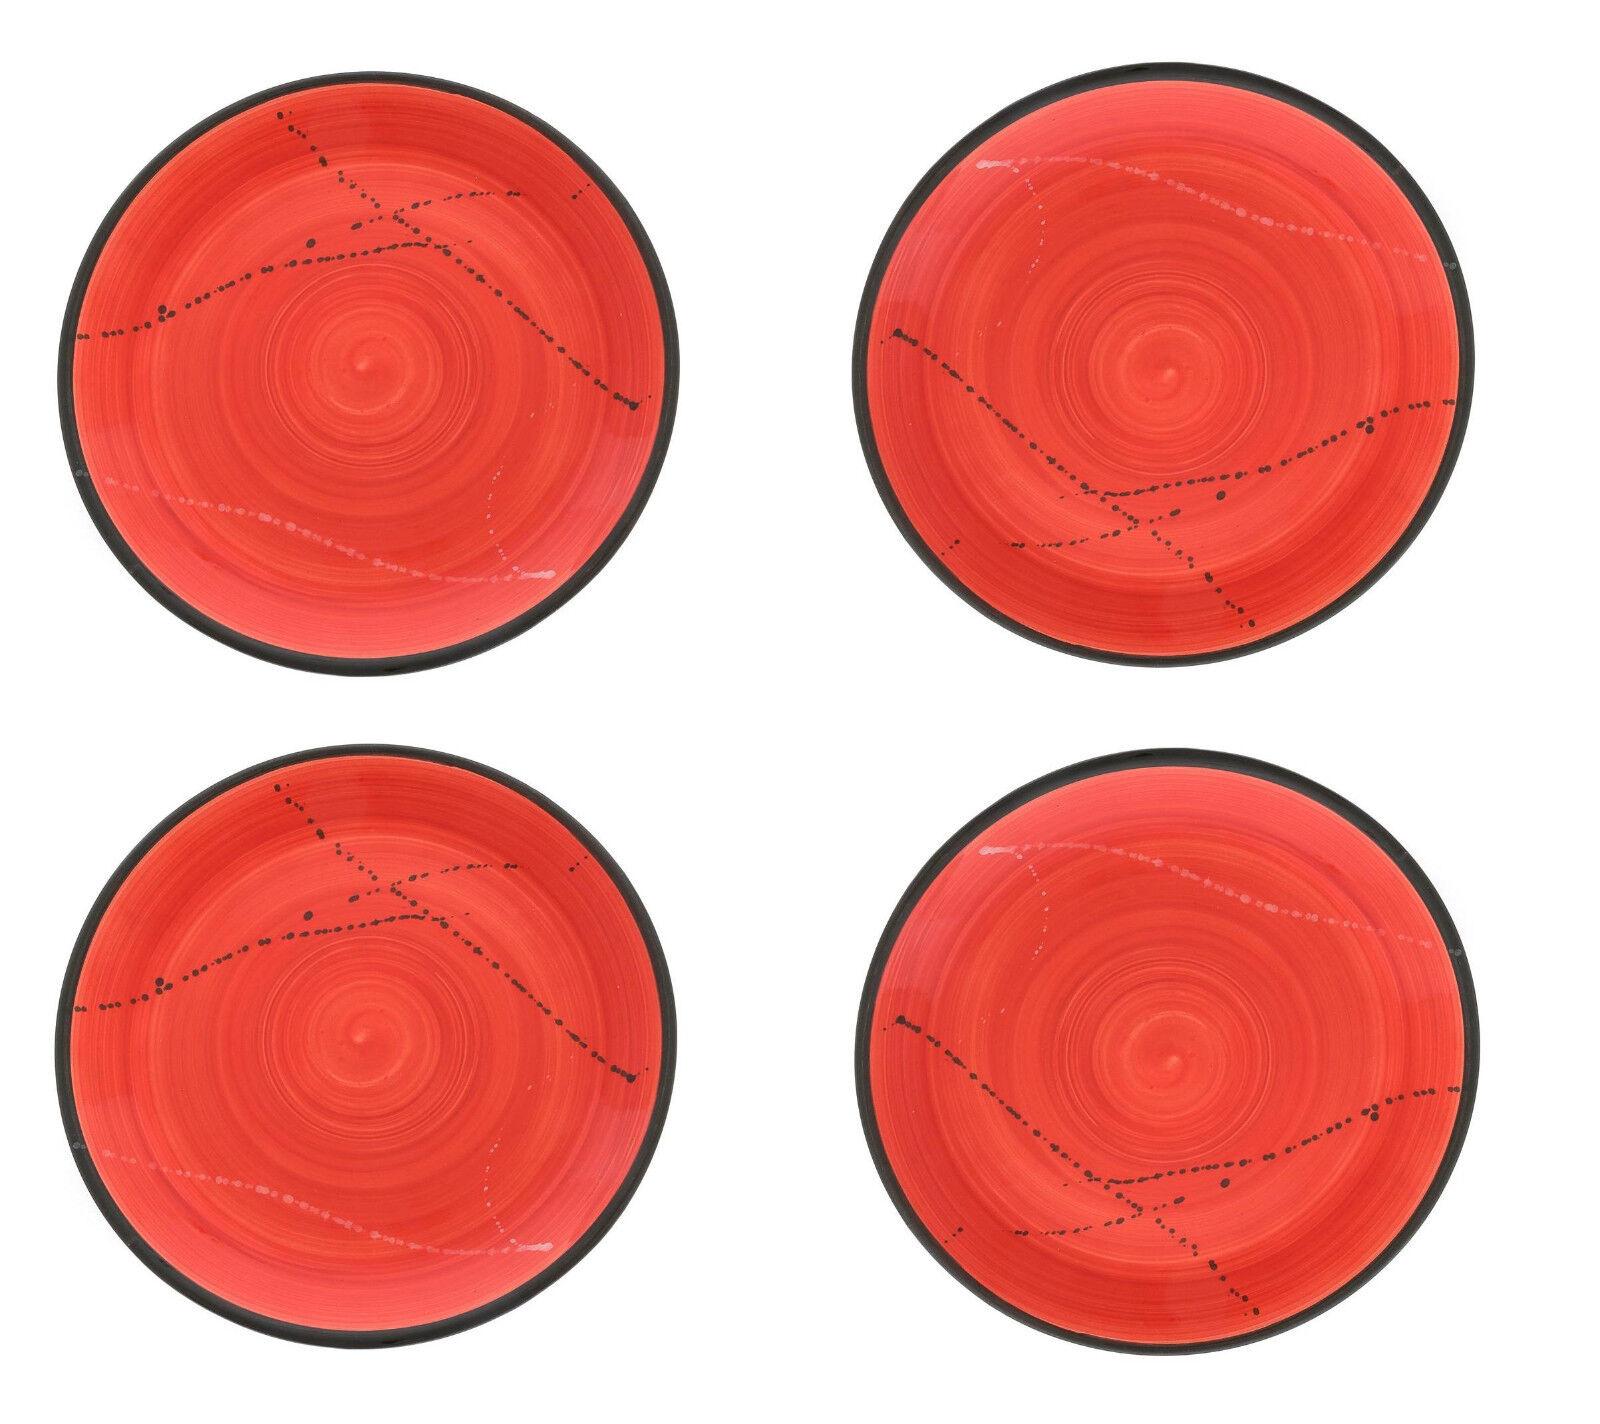 Dinner Main Plate or Dish Set of 4 - Handmade Ceramic - Red 10.6  - 27cm